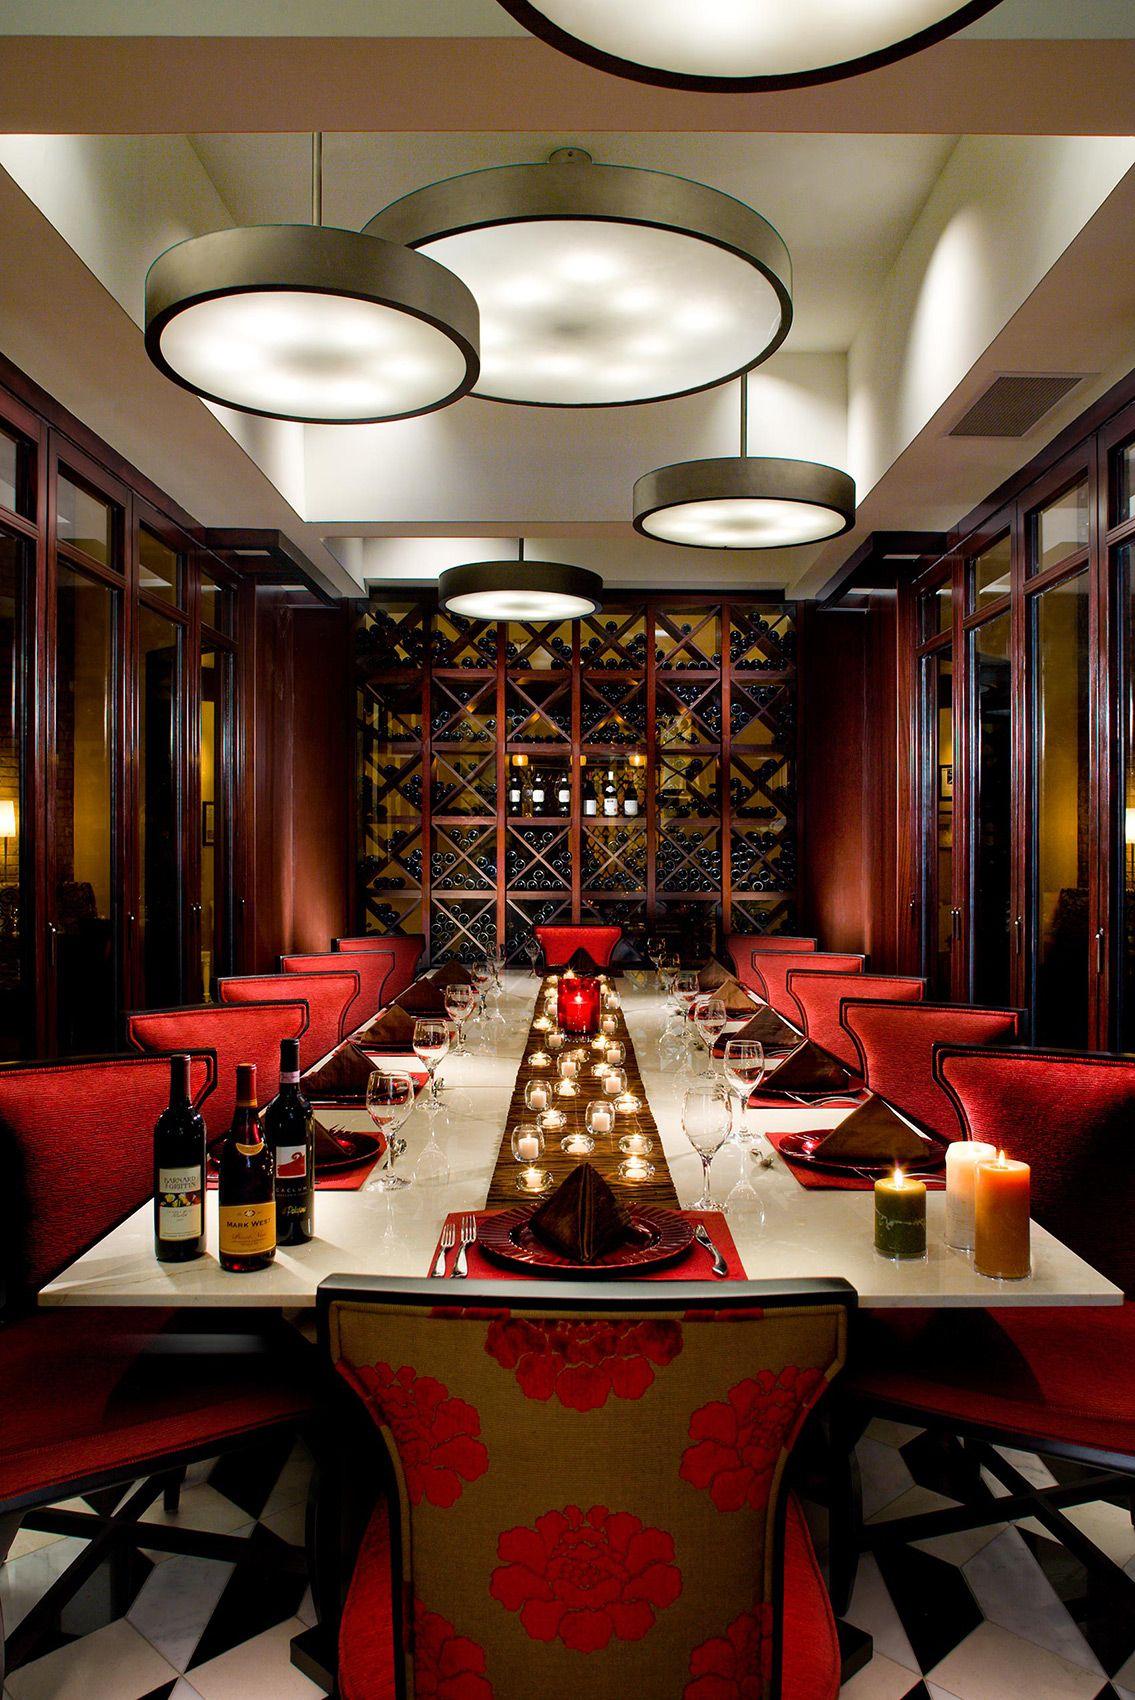 Hotels_Resorts_27.jpg